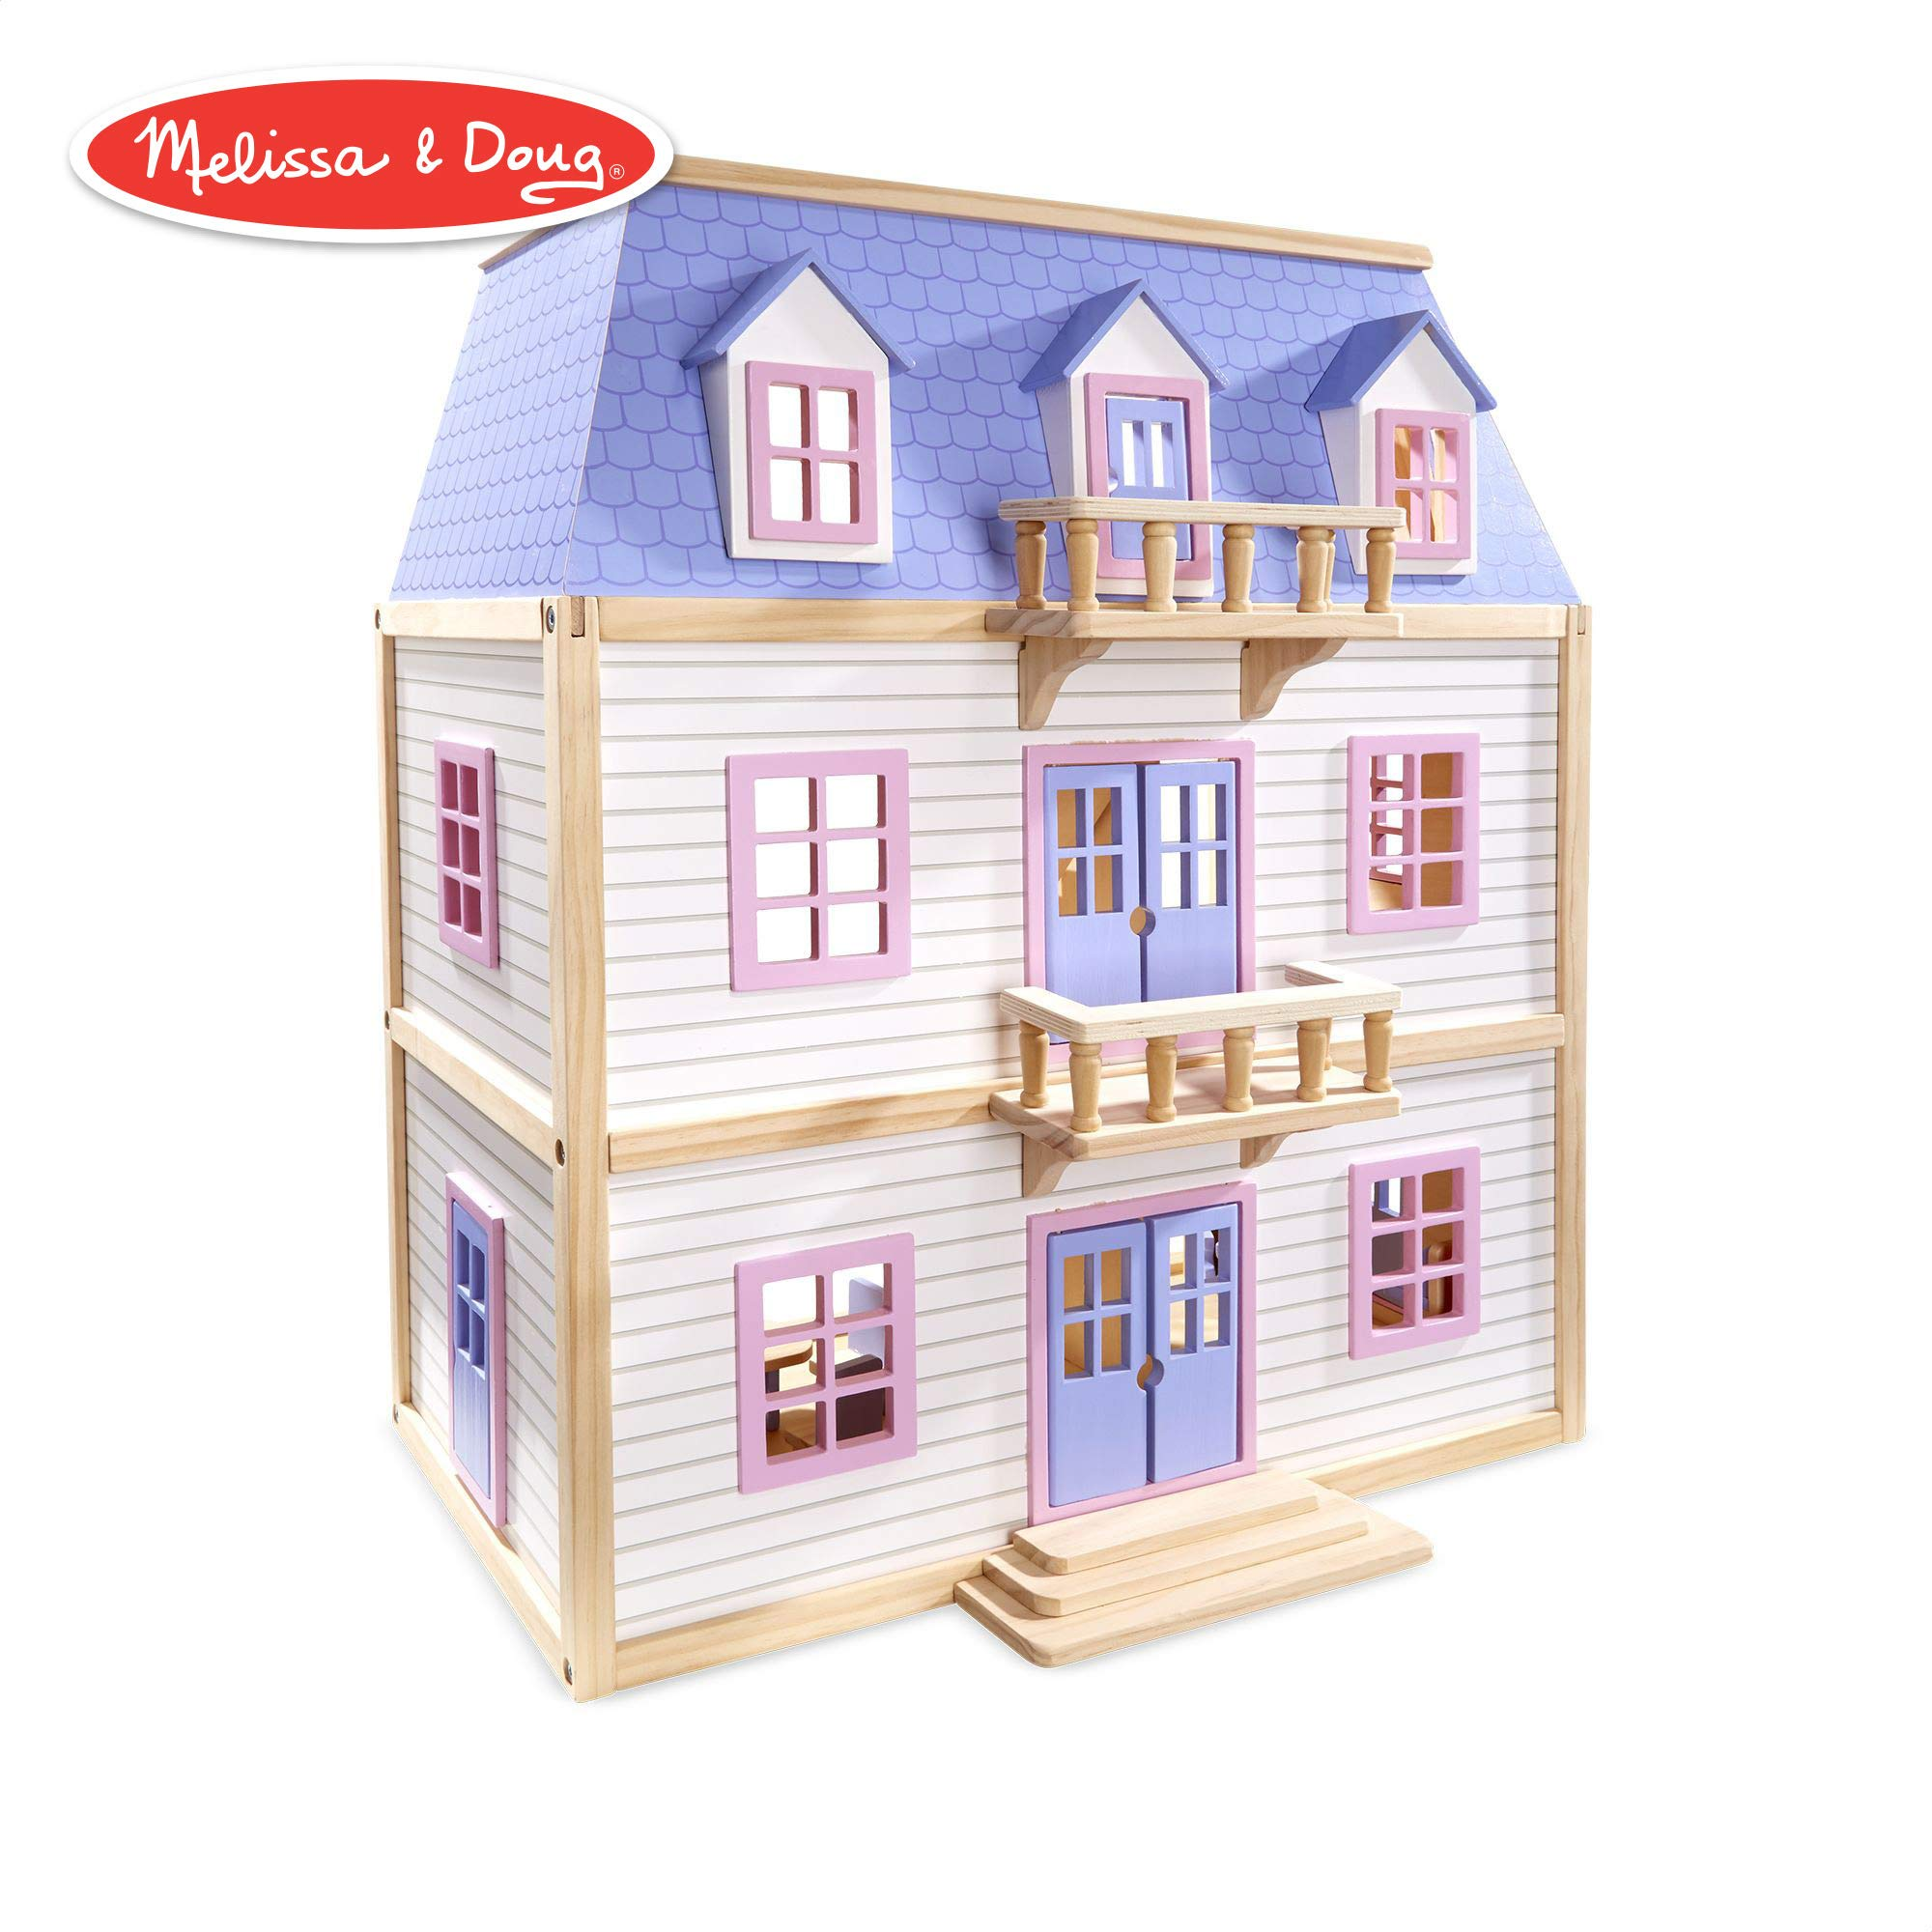 "Melissa & Doug Modern Wooden Multi-Level Dollhouse (Dolls & Dollhouses, 19 Pieces, White, 28"" H x 15.5"" W x 24"" L)"